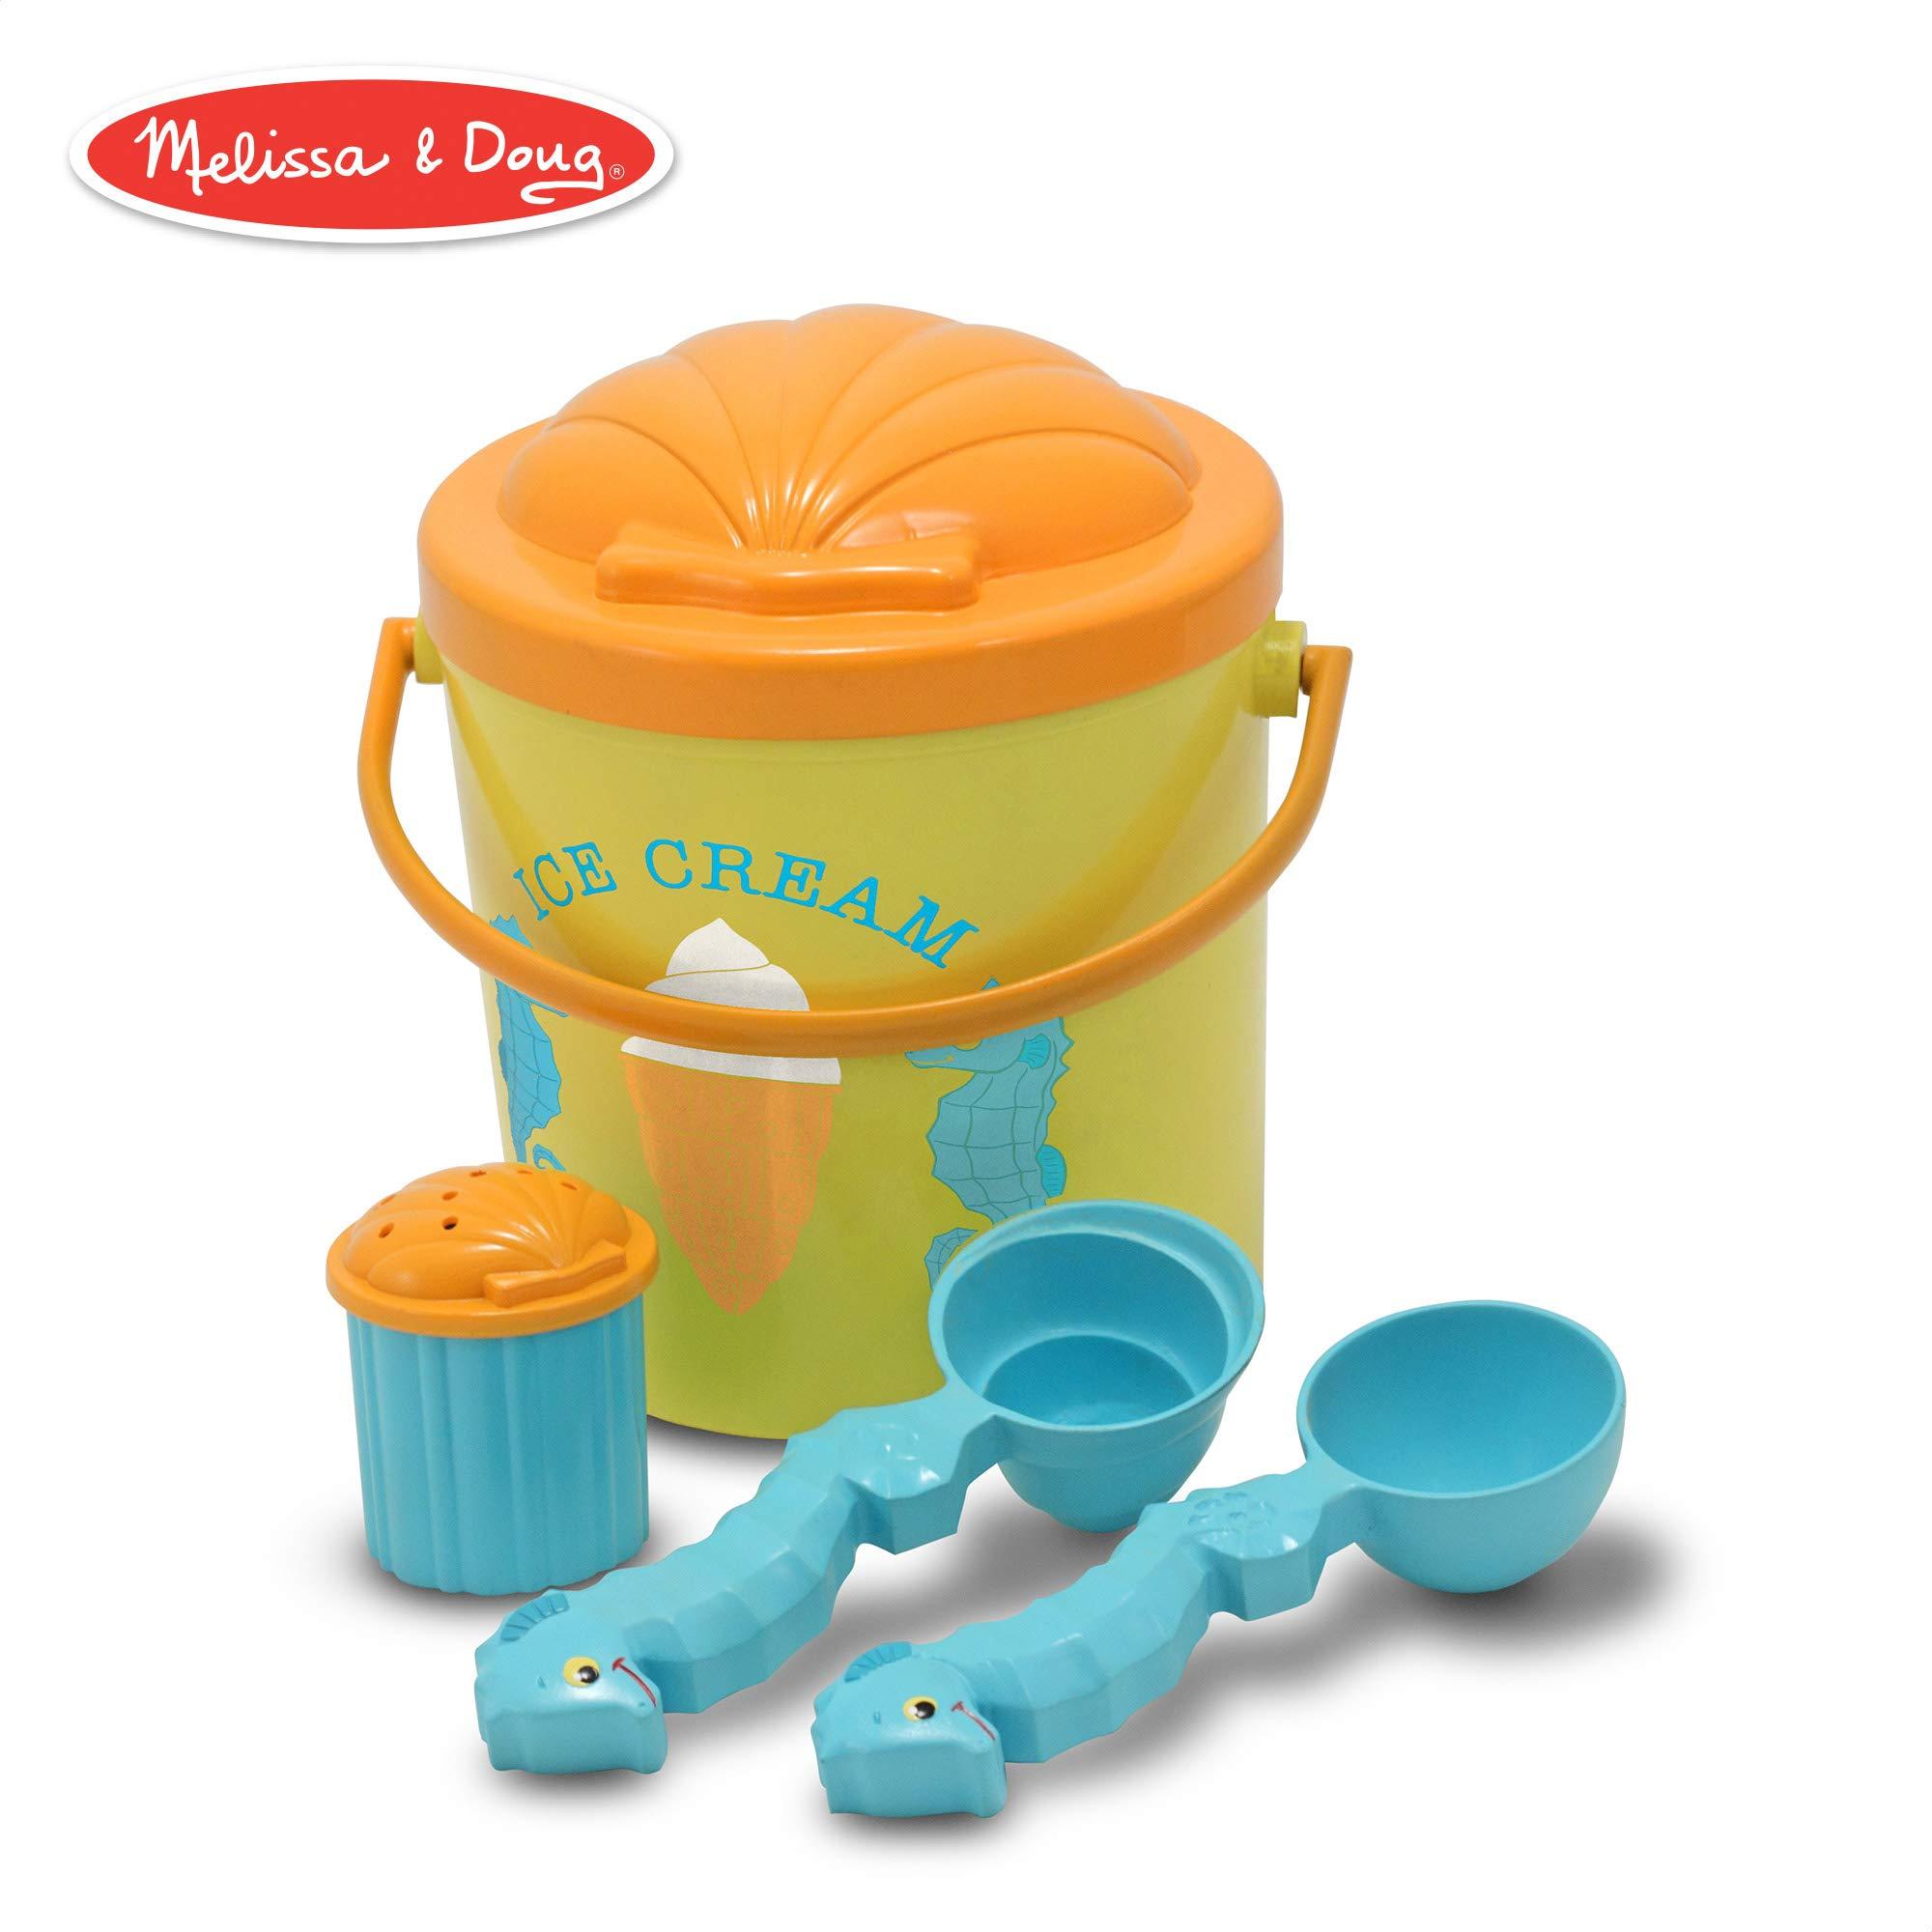 Melissa & Doug Sunny Patch Speck Seahorse Sand Ice Cream Play Set (Beach and Sandbox Toy, 6 Pieces)